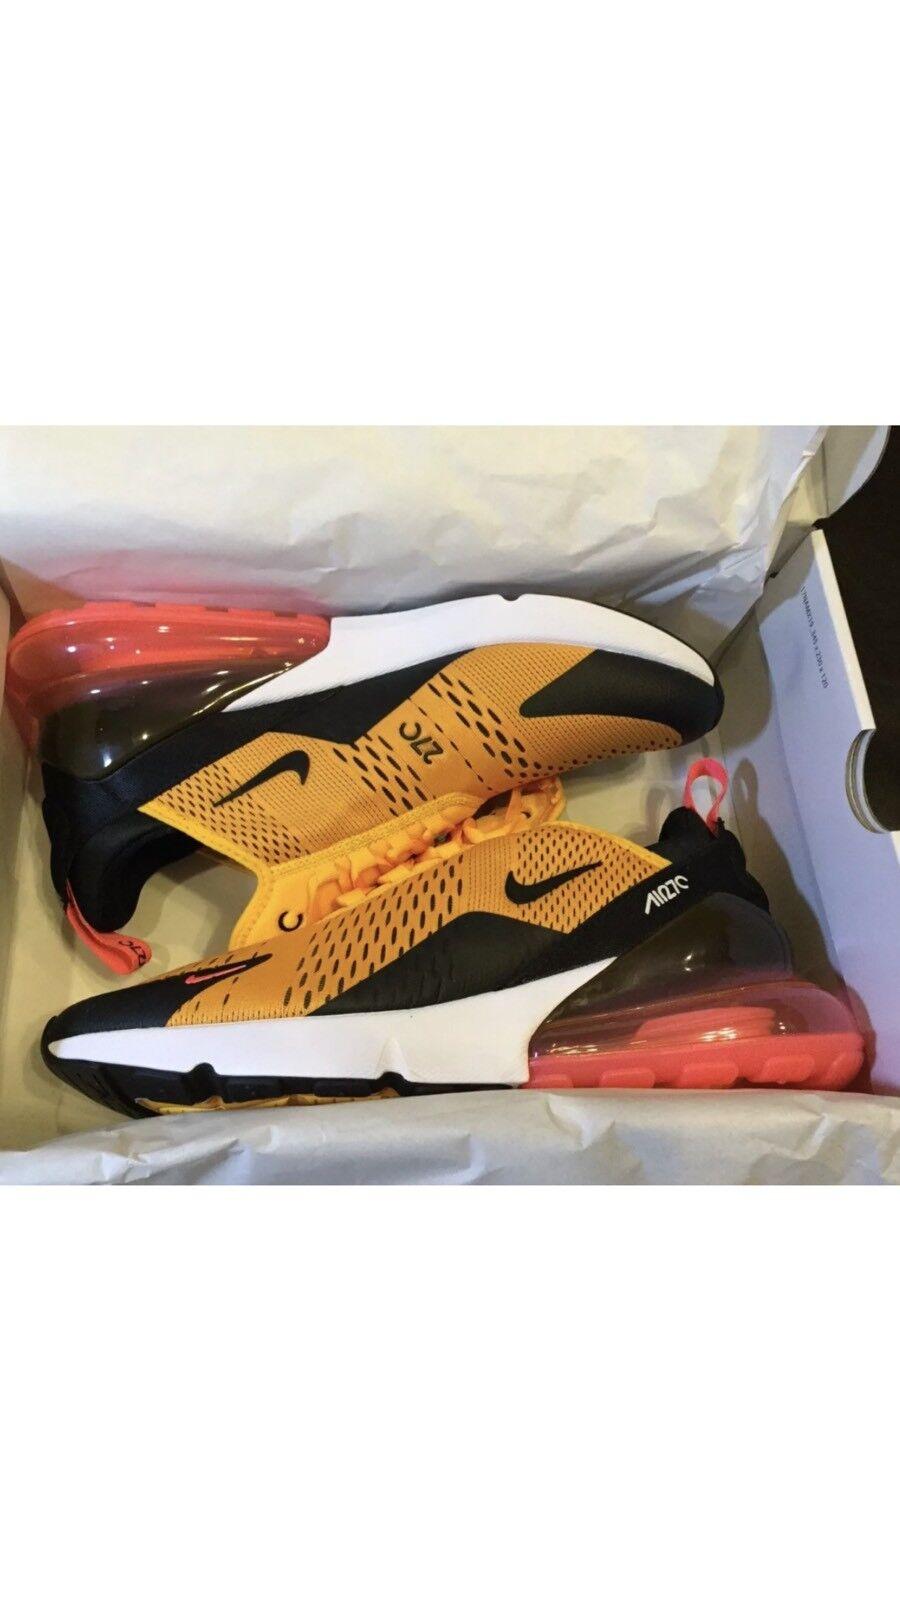 09ae4b5e9c NEW Nike Air Max 270 Tiger Black University gold AH8050-004 Size 9.5 AND 10